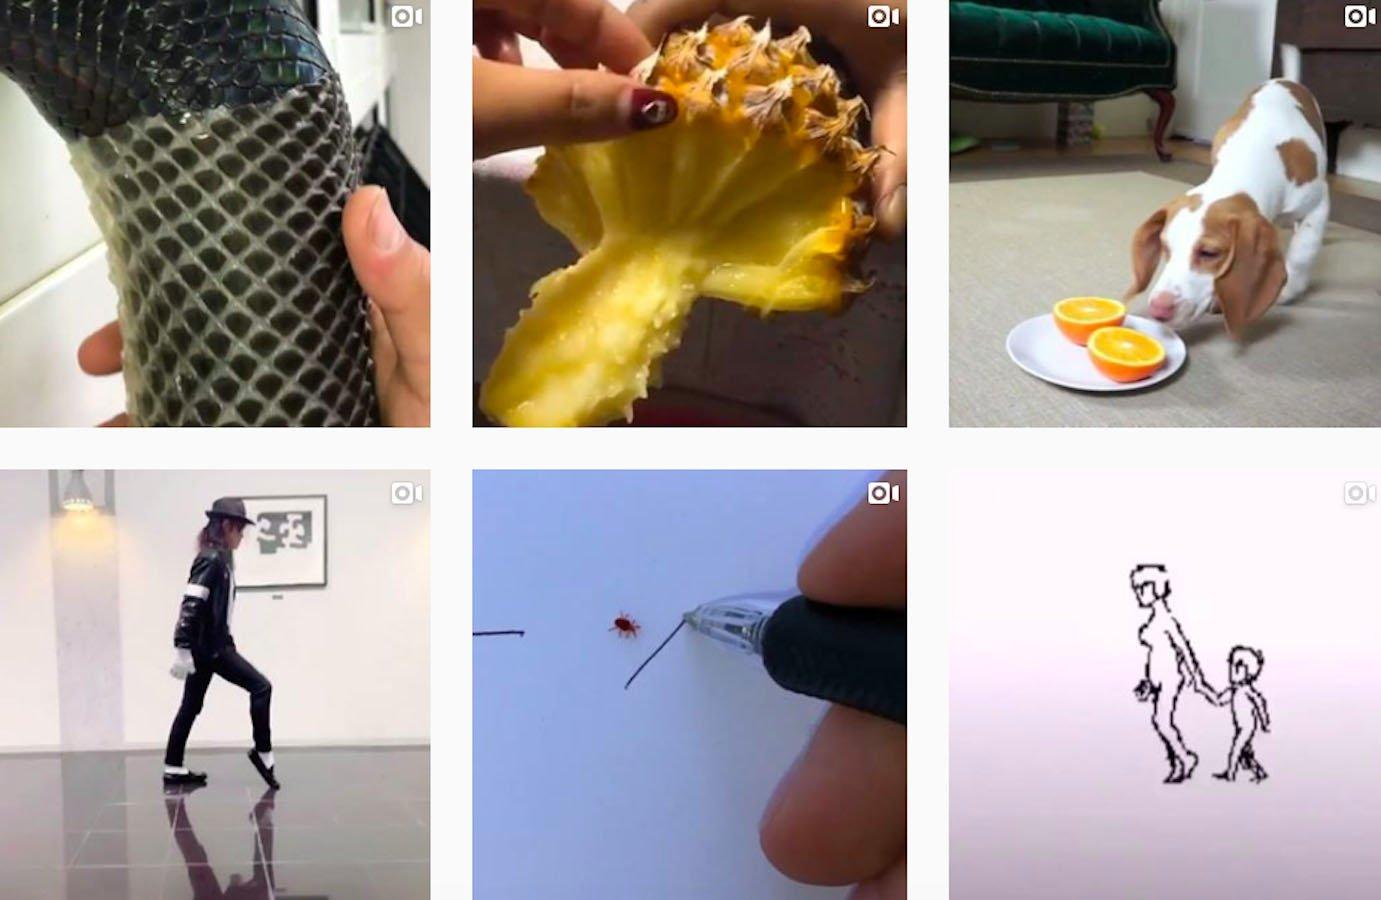 Web Design Inspiration: 110+ Accounts On Instagram and 10+ Best UX & Web Design Books in 2020 - streetartglobe